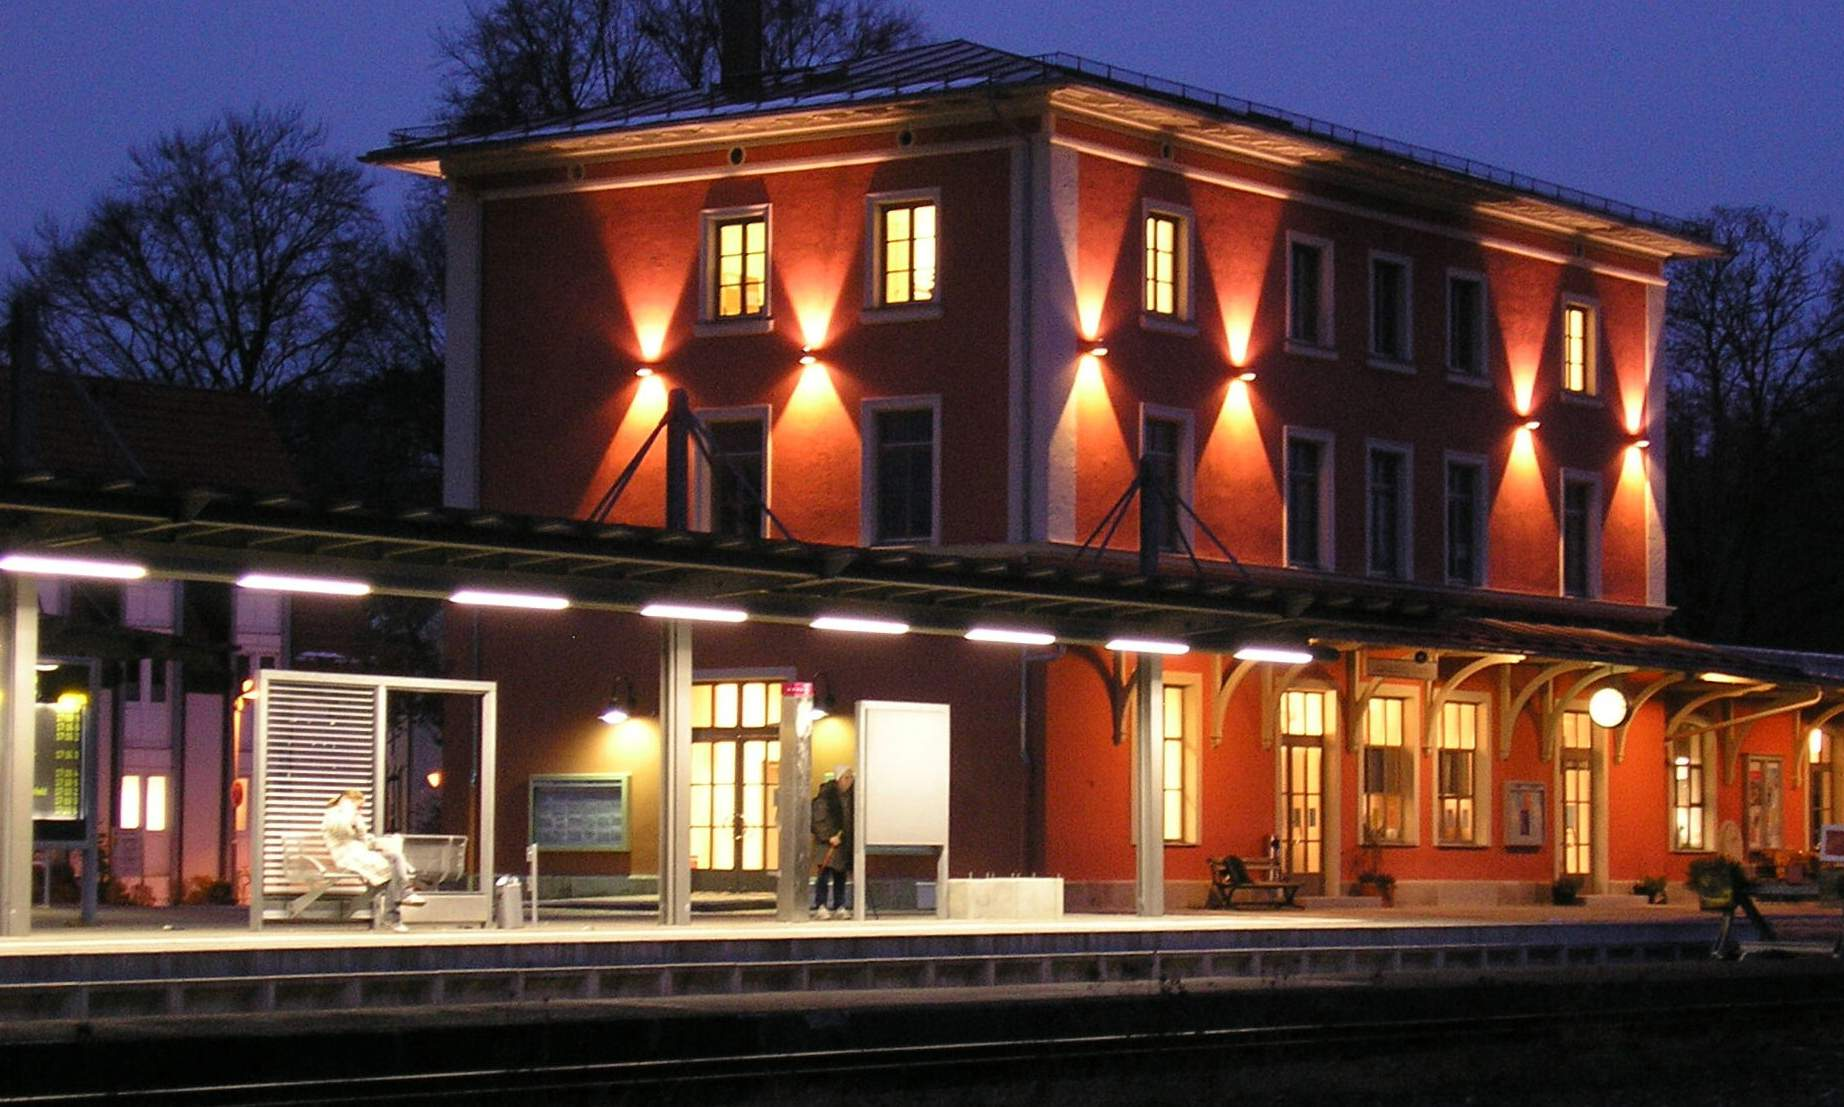 EFI-Landsberg.de